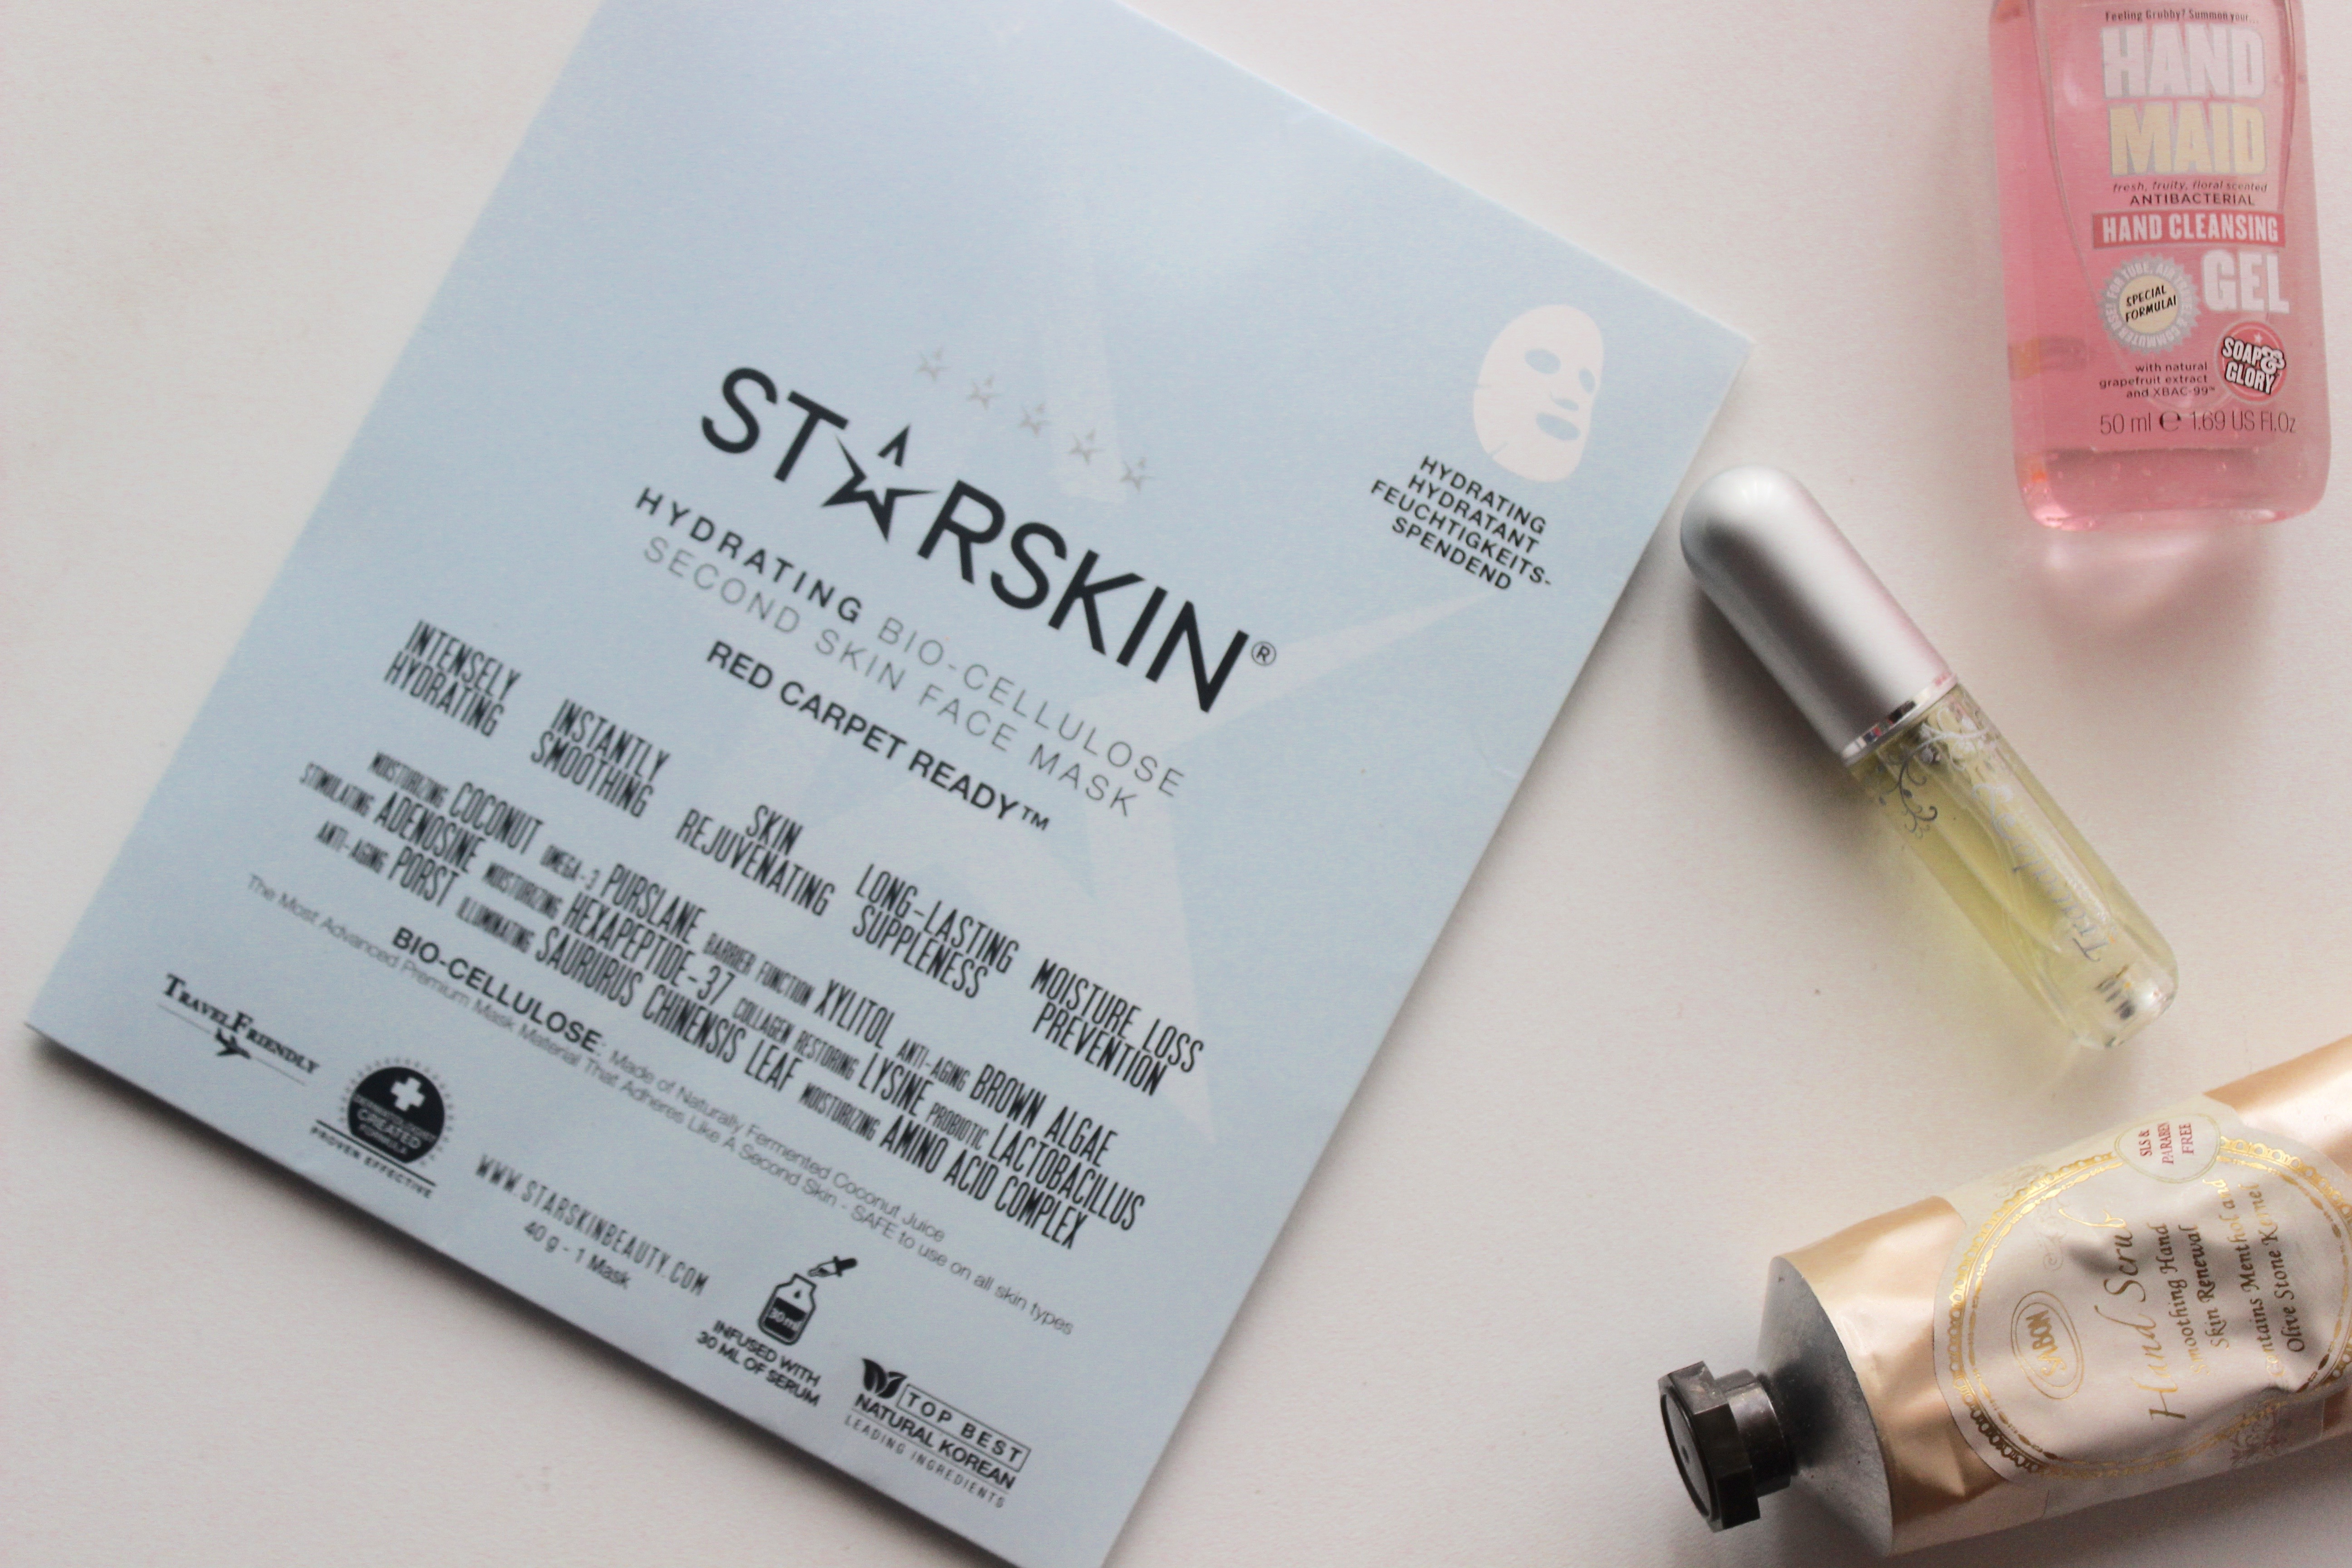 starskin mask review